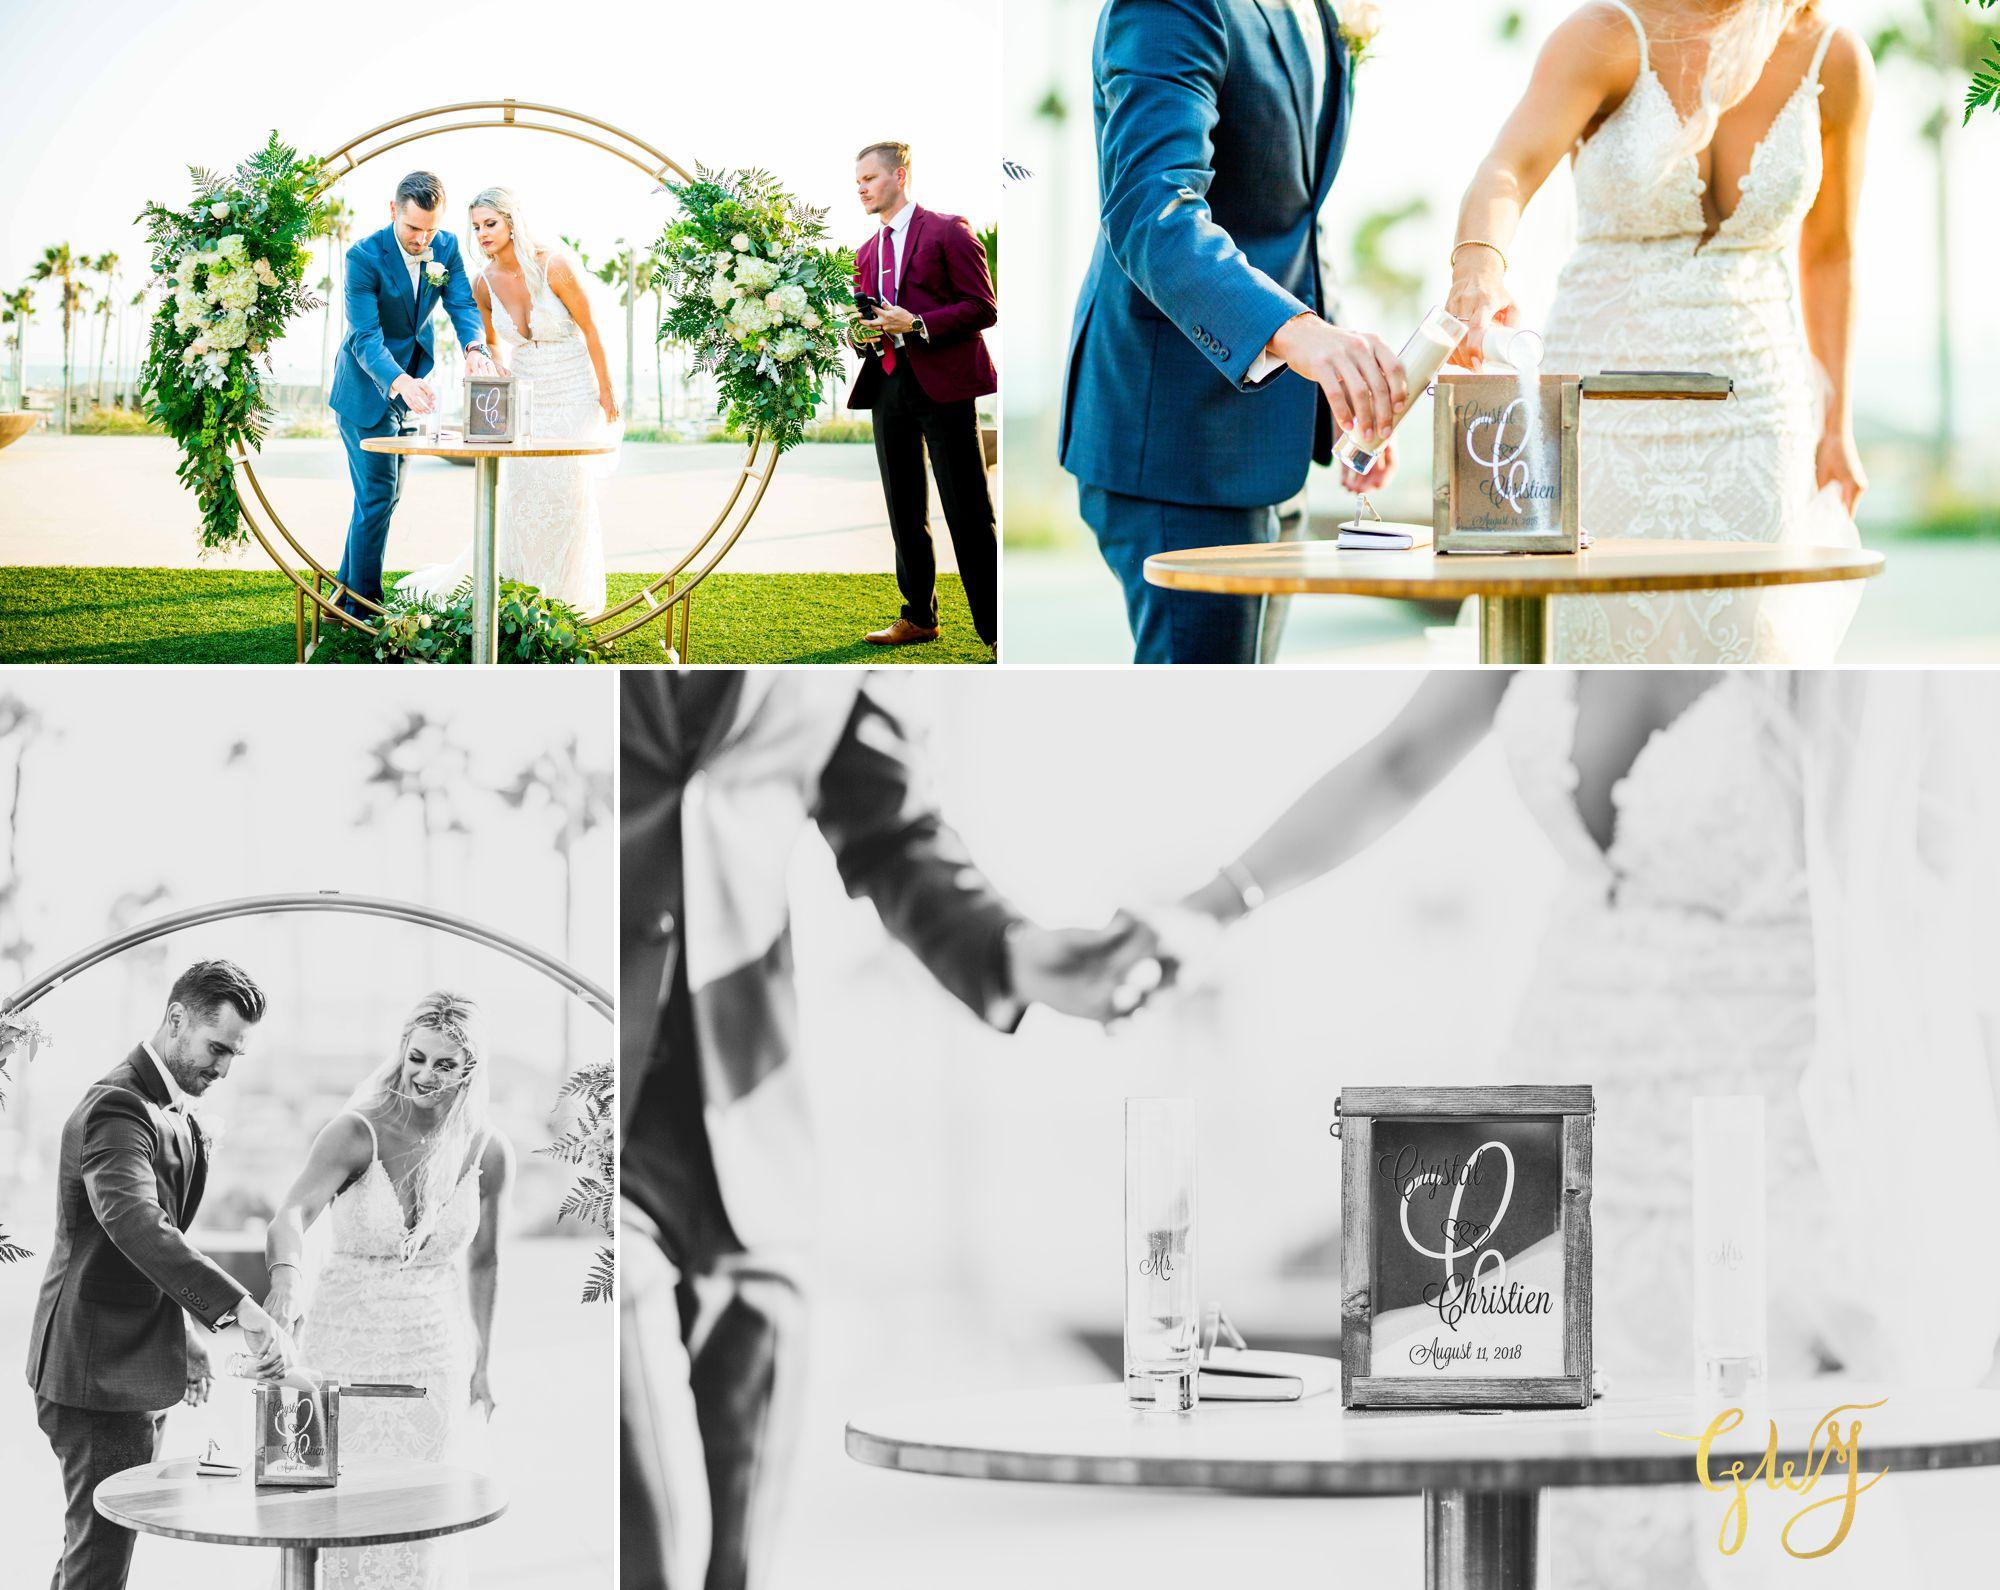 Christien + Crystal Pasea Hotel & Spa Huntington Beach Wedding by Glass Woods Media 49.jpg